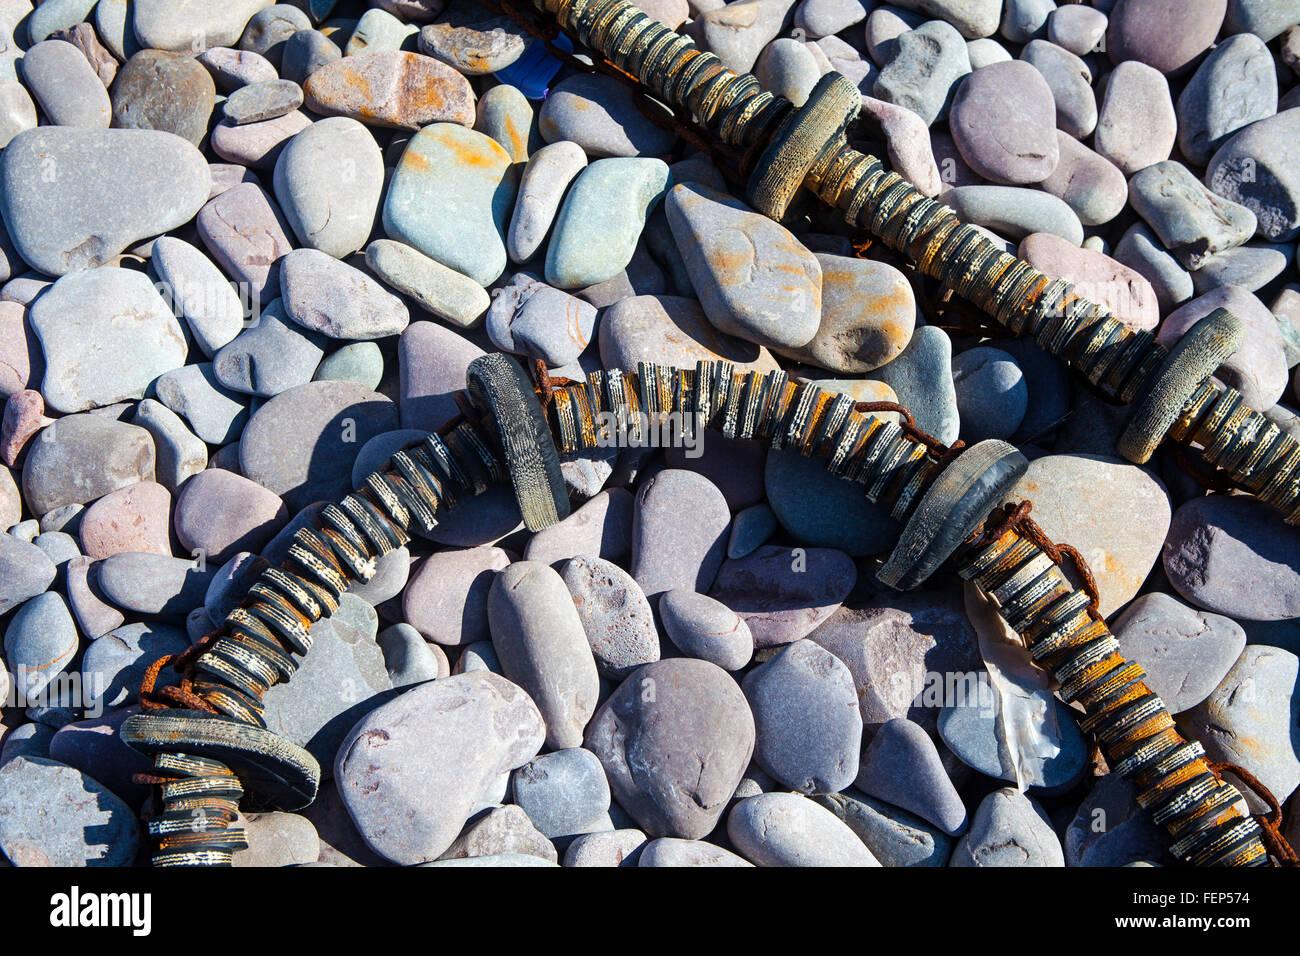 Stone pebbles on a beach in bright sun light - Stock Image